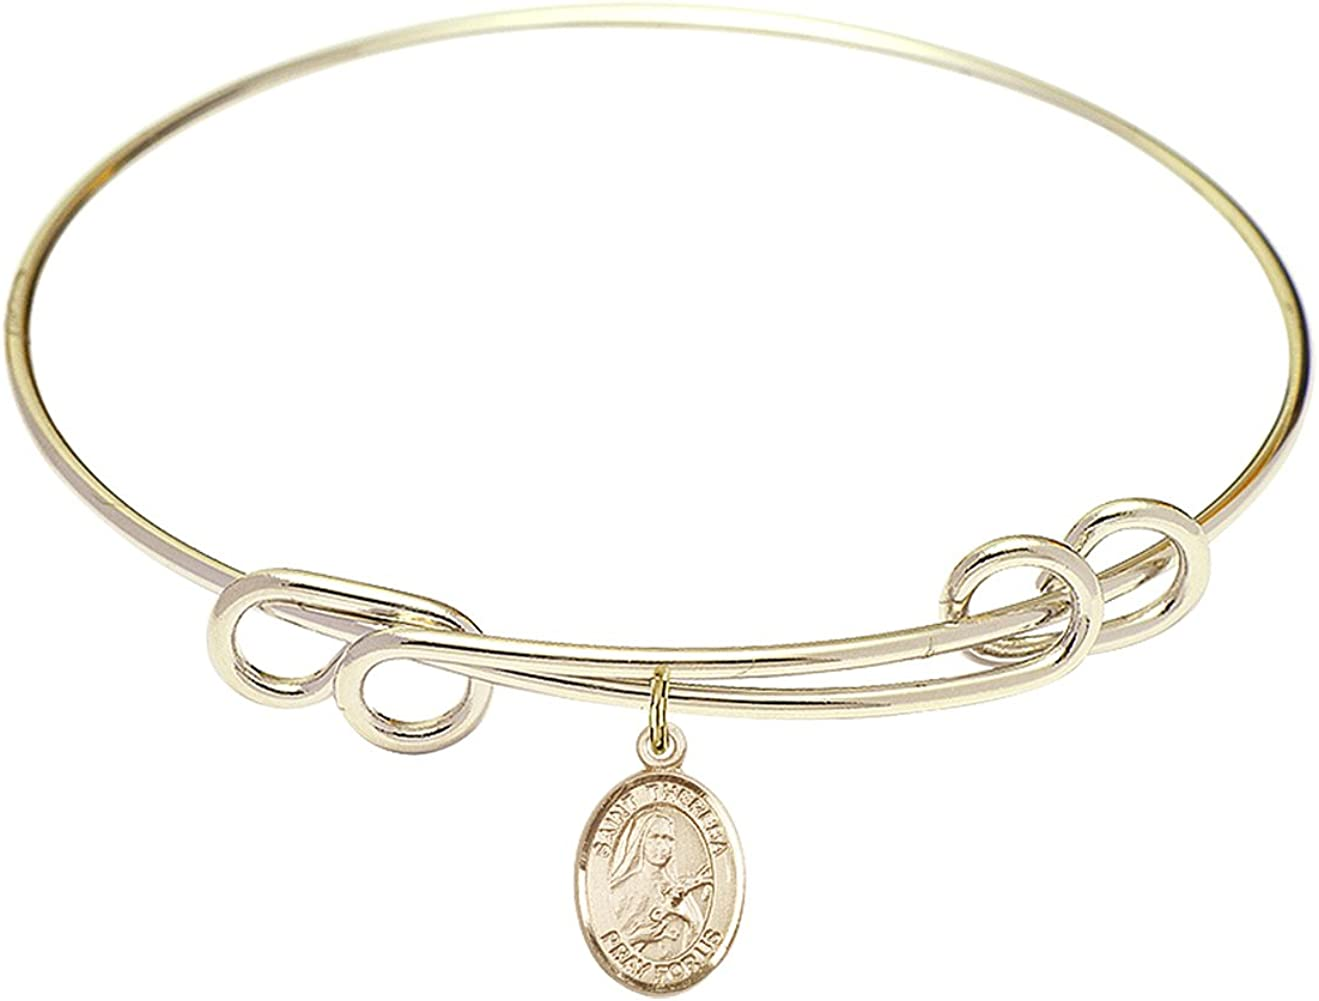 Max 61% OFF Bonyak Jewelry Round Cheap sale Double Loop Bangle i Bracelet w St. Theresa